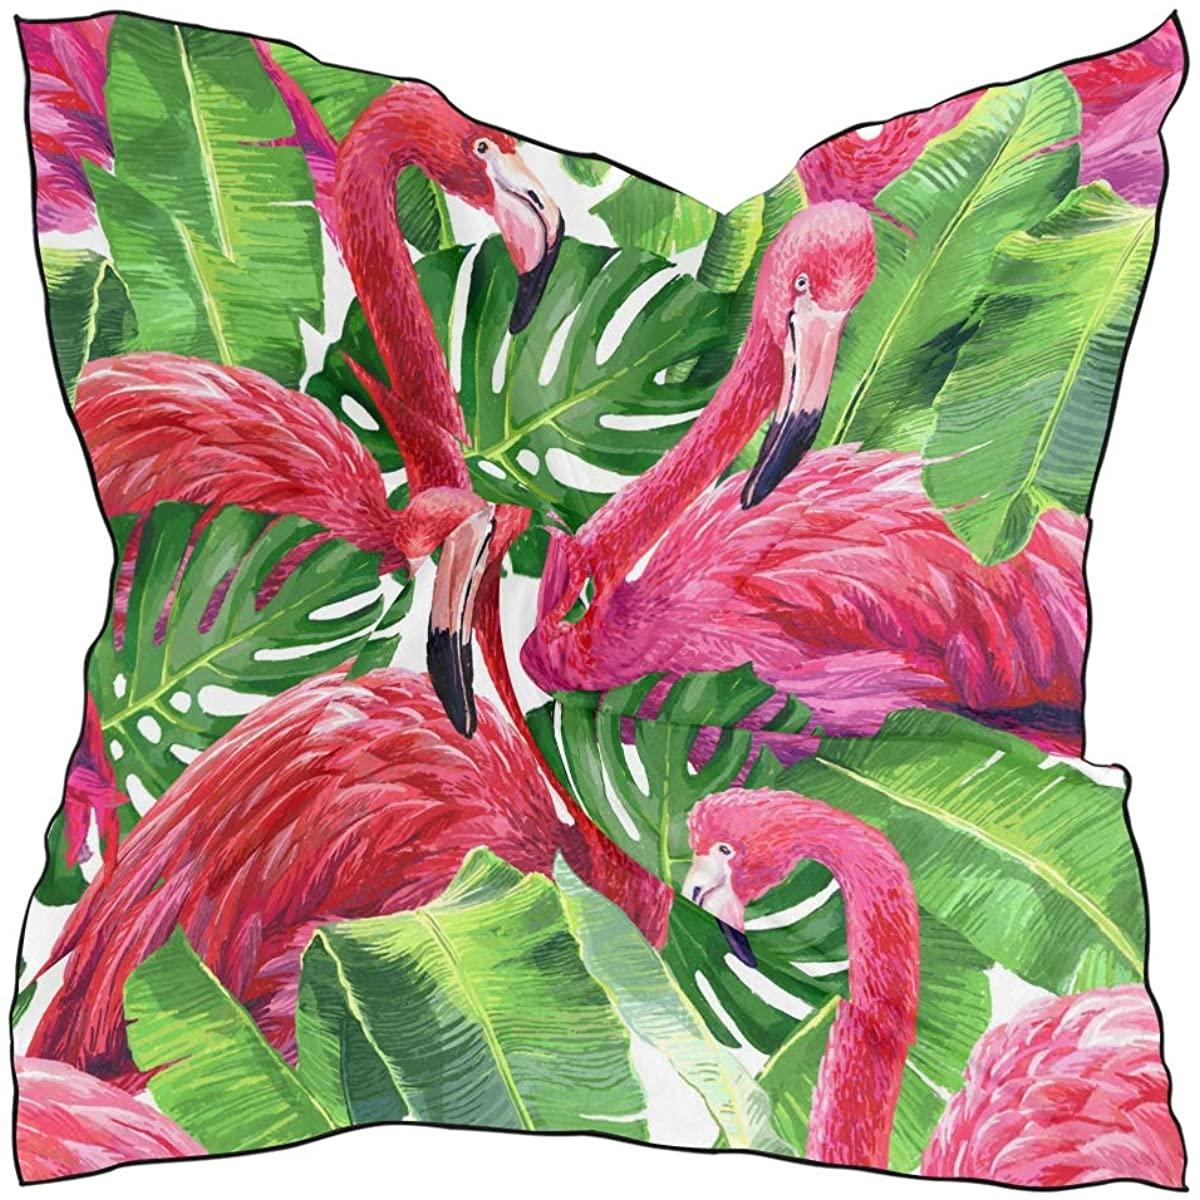 XLING Fashion Square Scarf Animal Flamingo Palm Leaves Lightweight Sunscreen Silk Scarves Muffler Hair Wrap Headscarf Neckerchief for Women Men